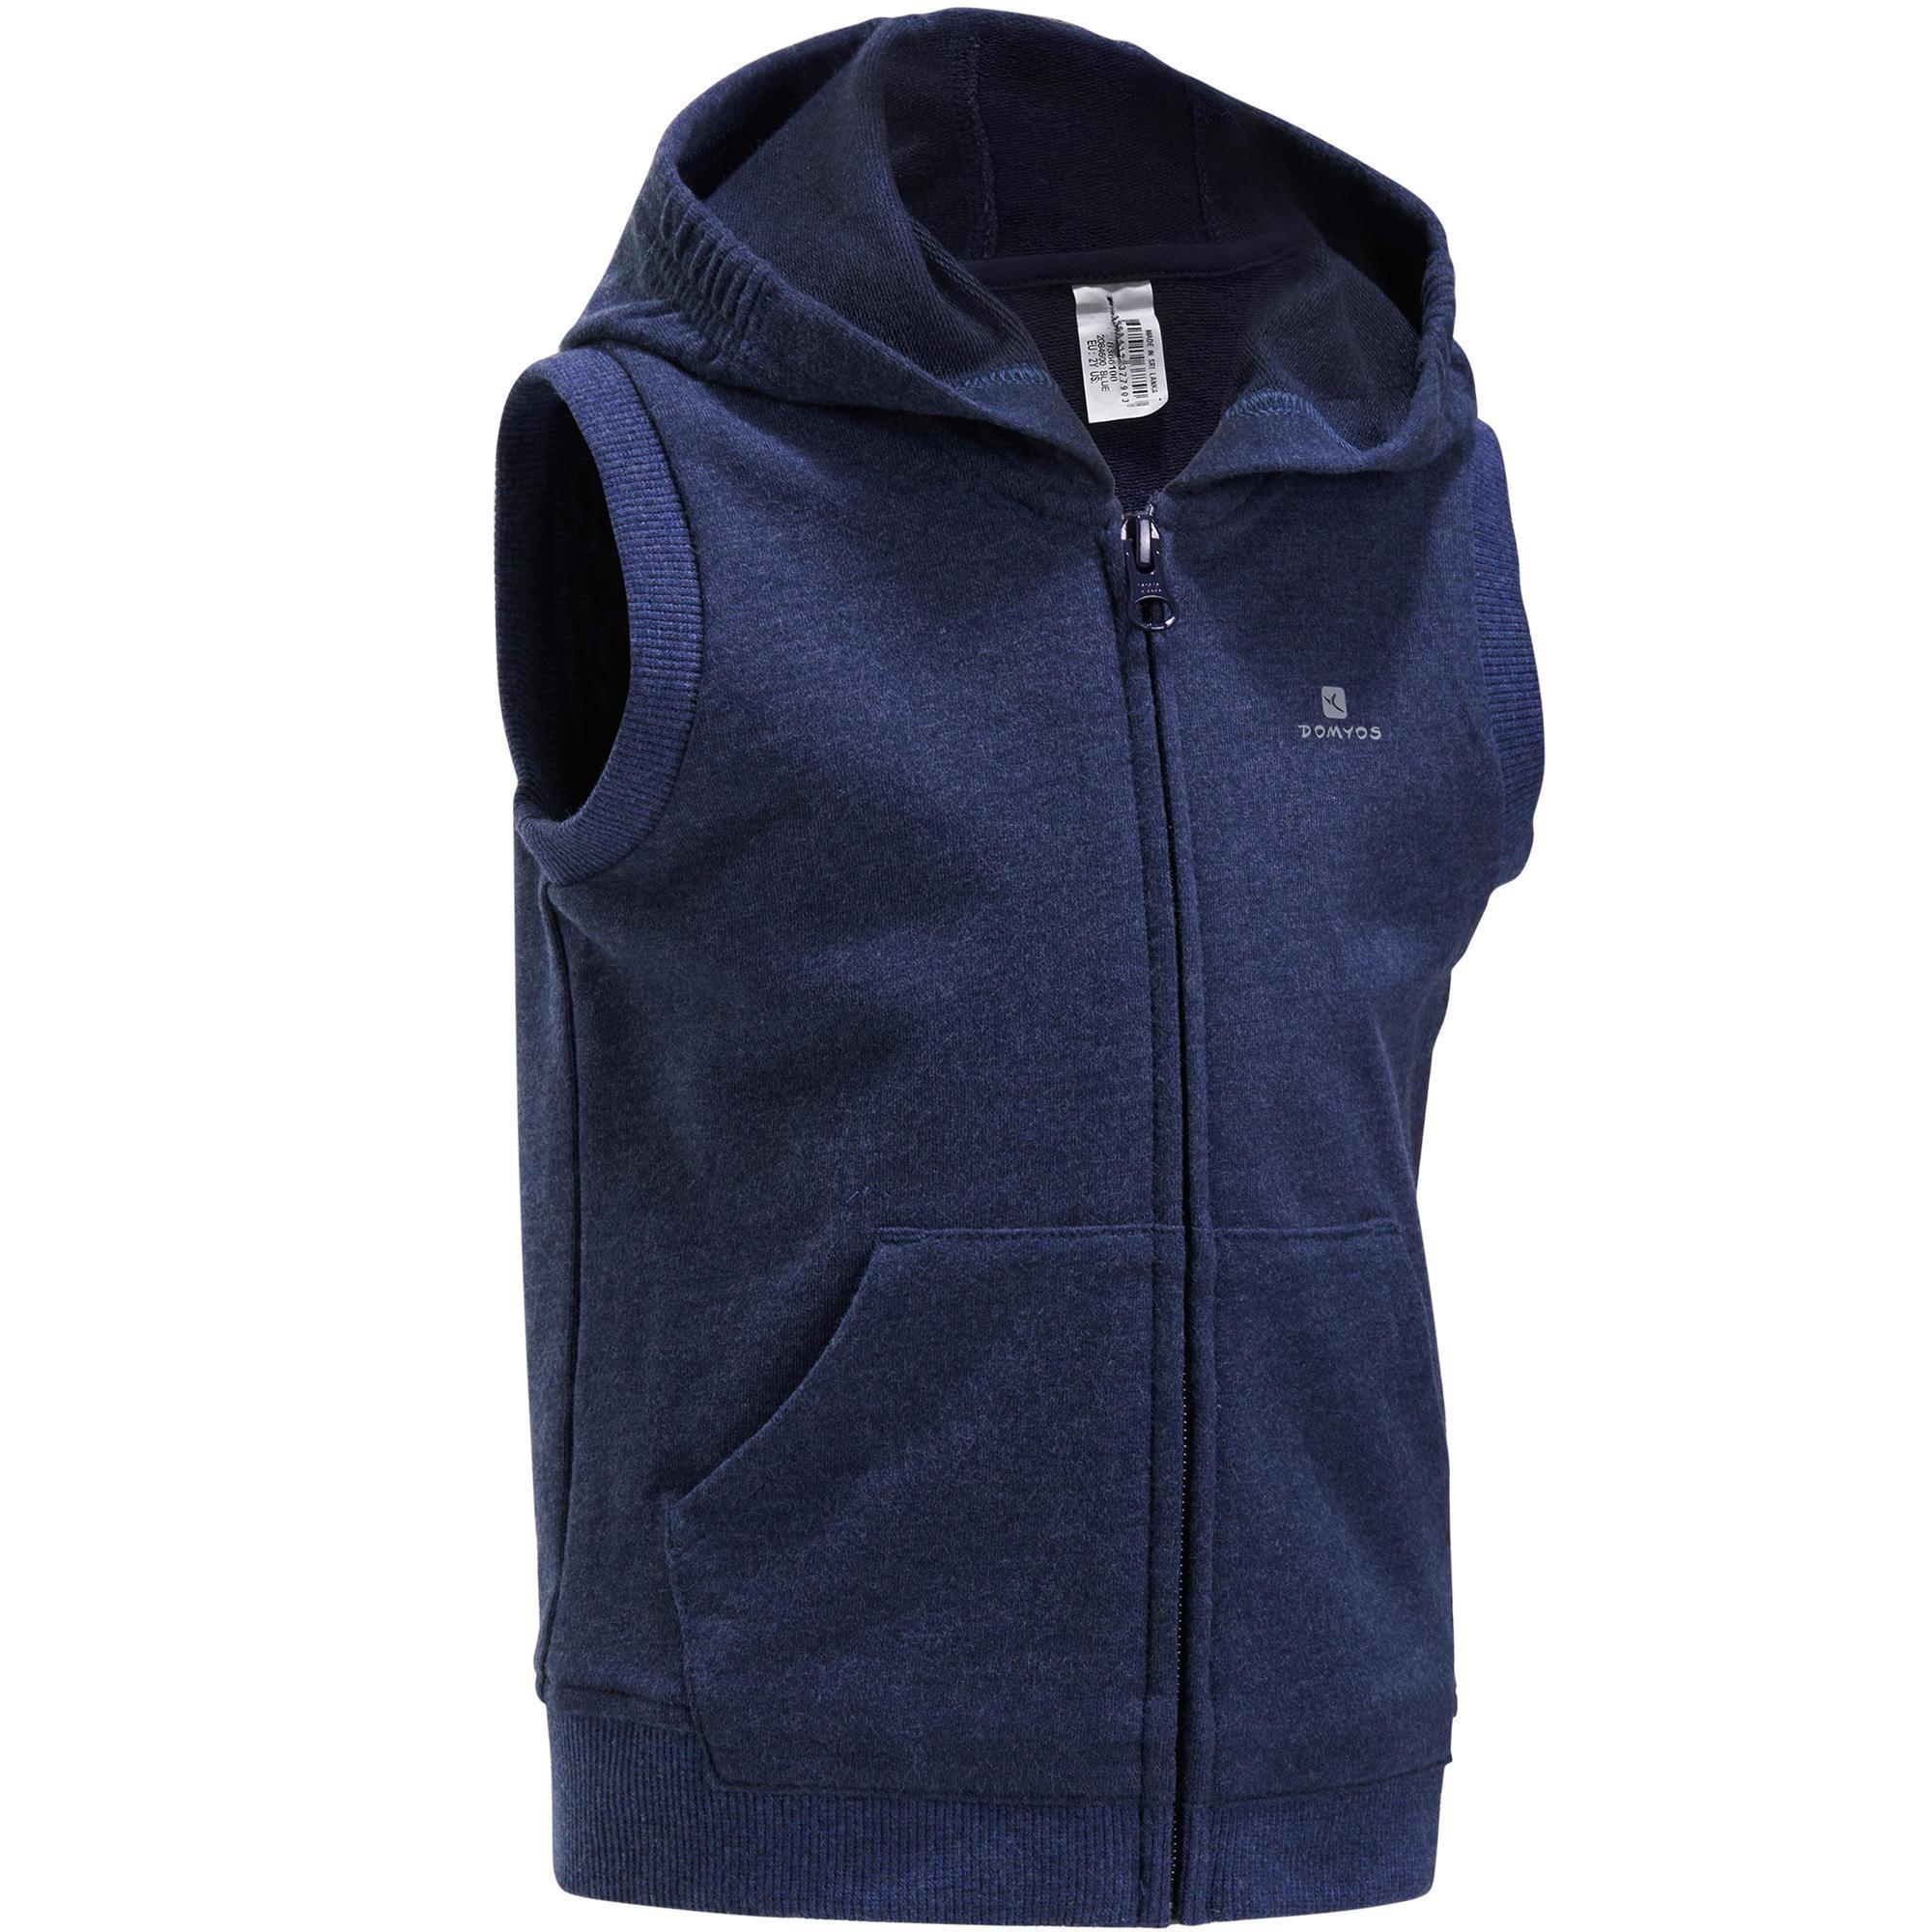 veste chaude sans manches zipp e capuche gym baby bleu domyos by decathlon. Black Bedroom Furniture Sets. Home Design Ideas